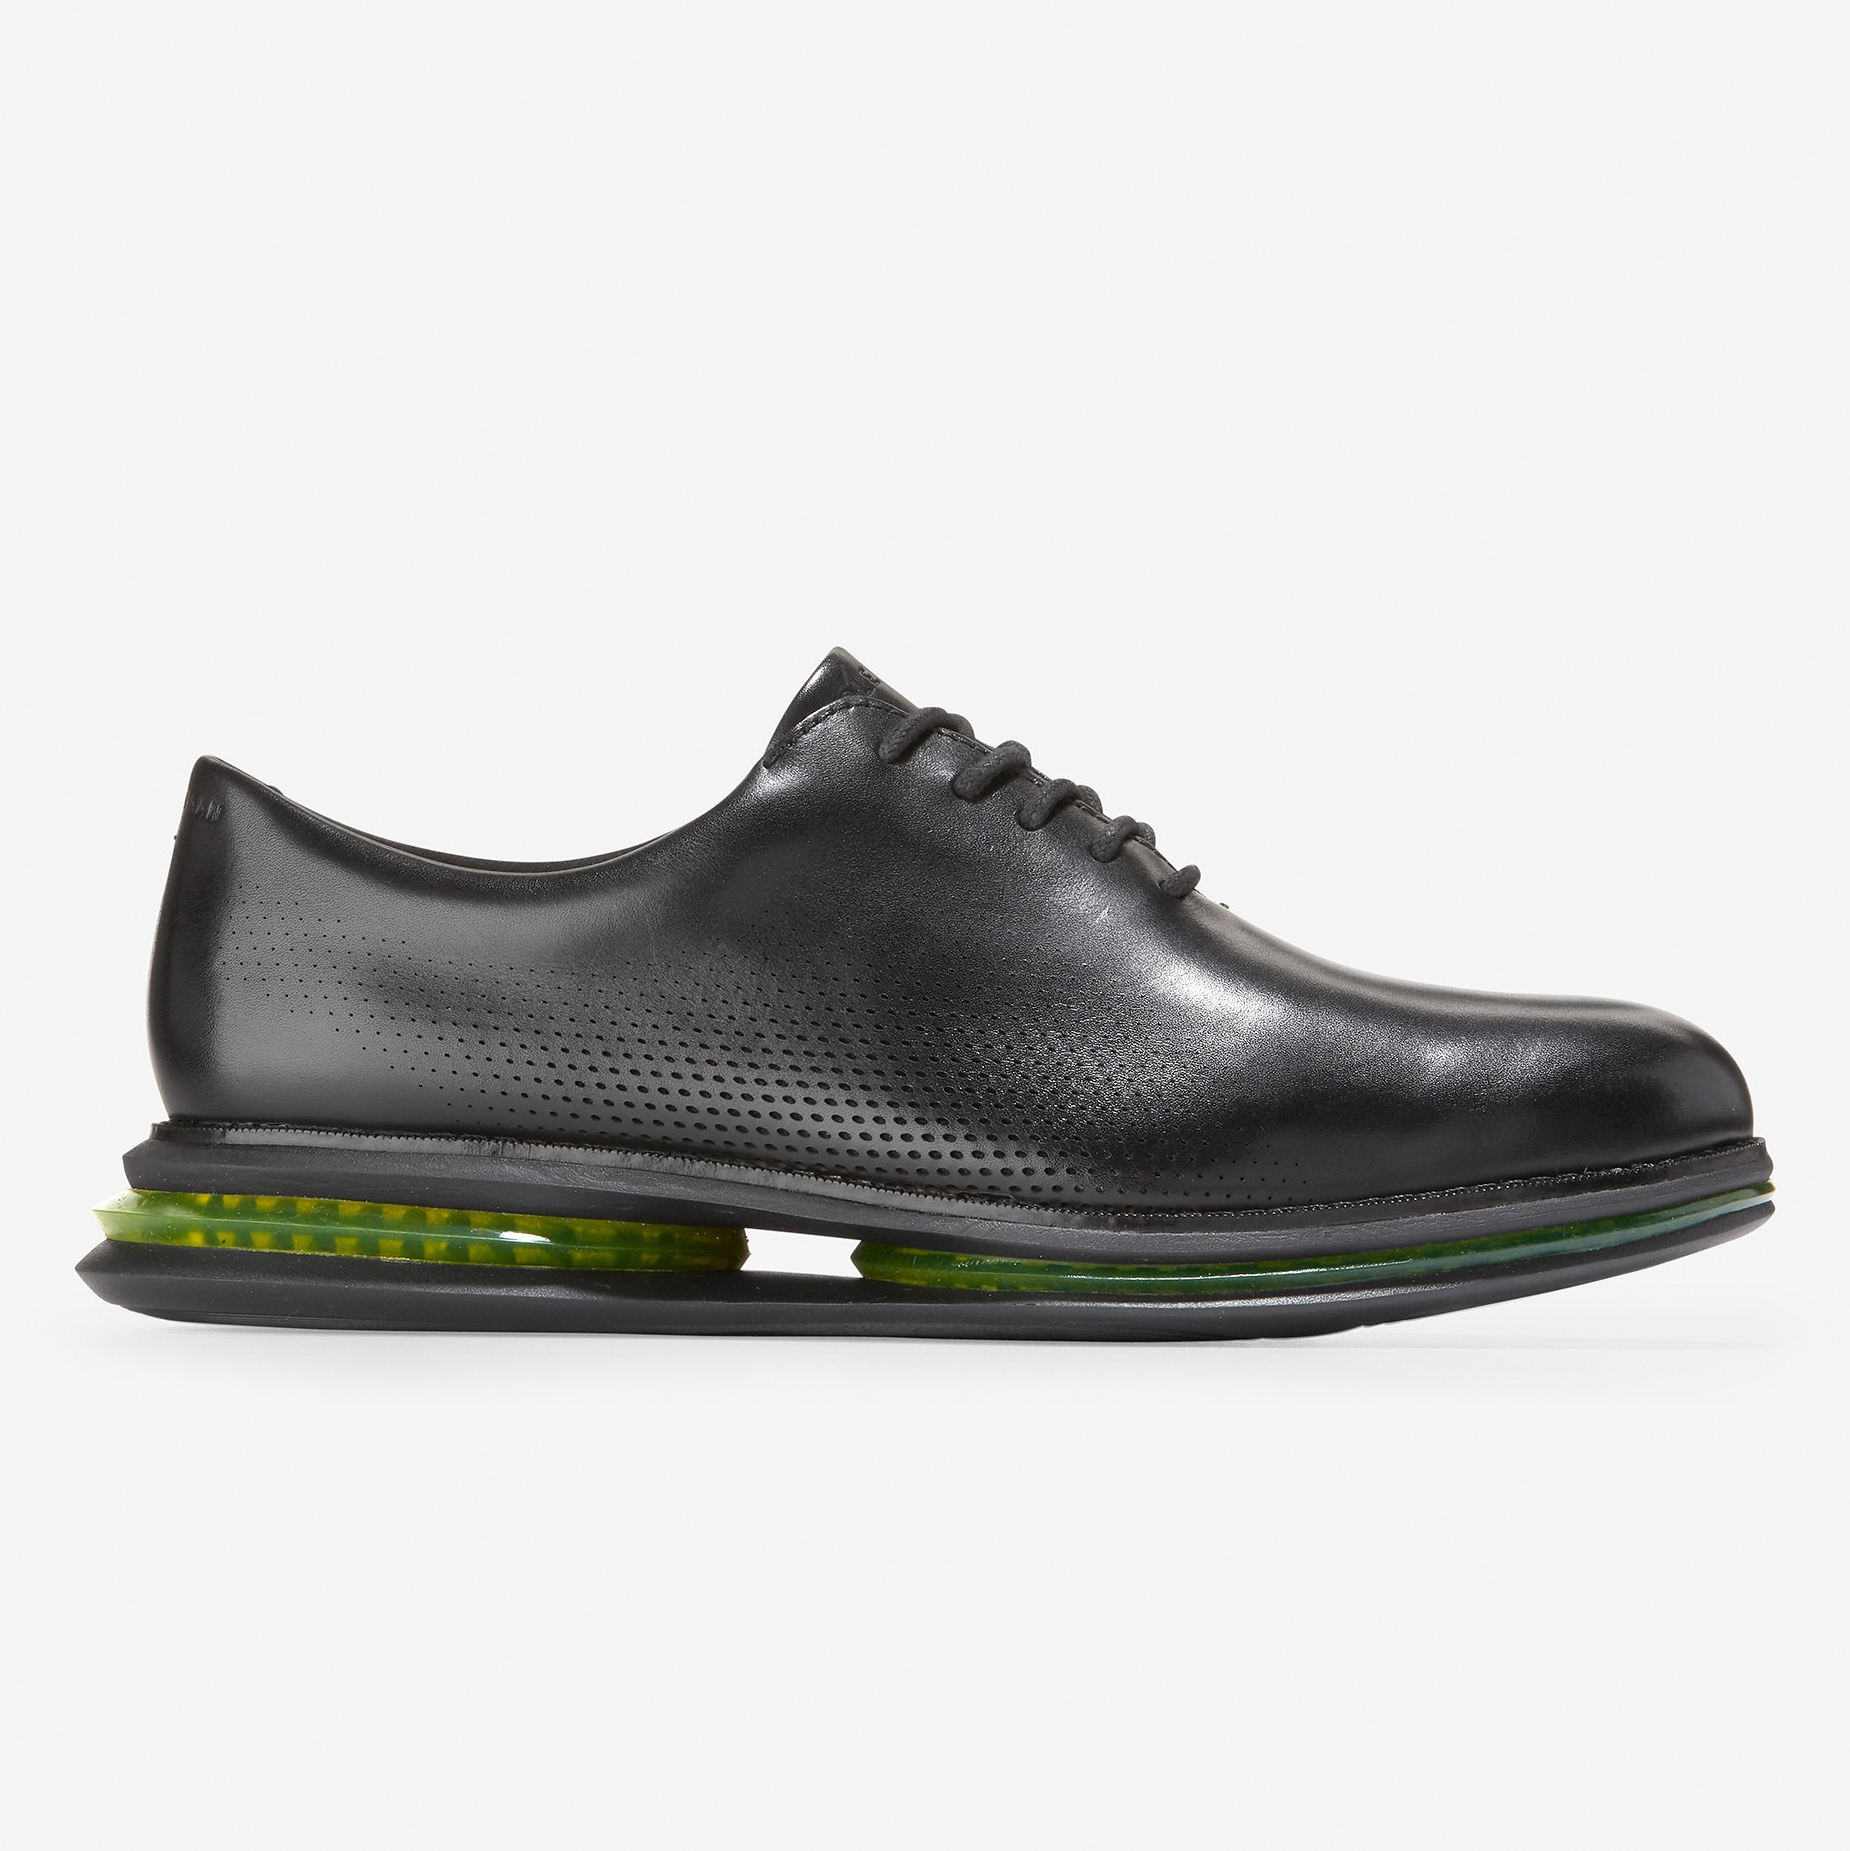 Cole Haan ØriginalGrand Energy Twin Oxford, most comfortable dress shoes